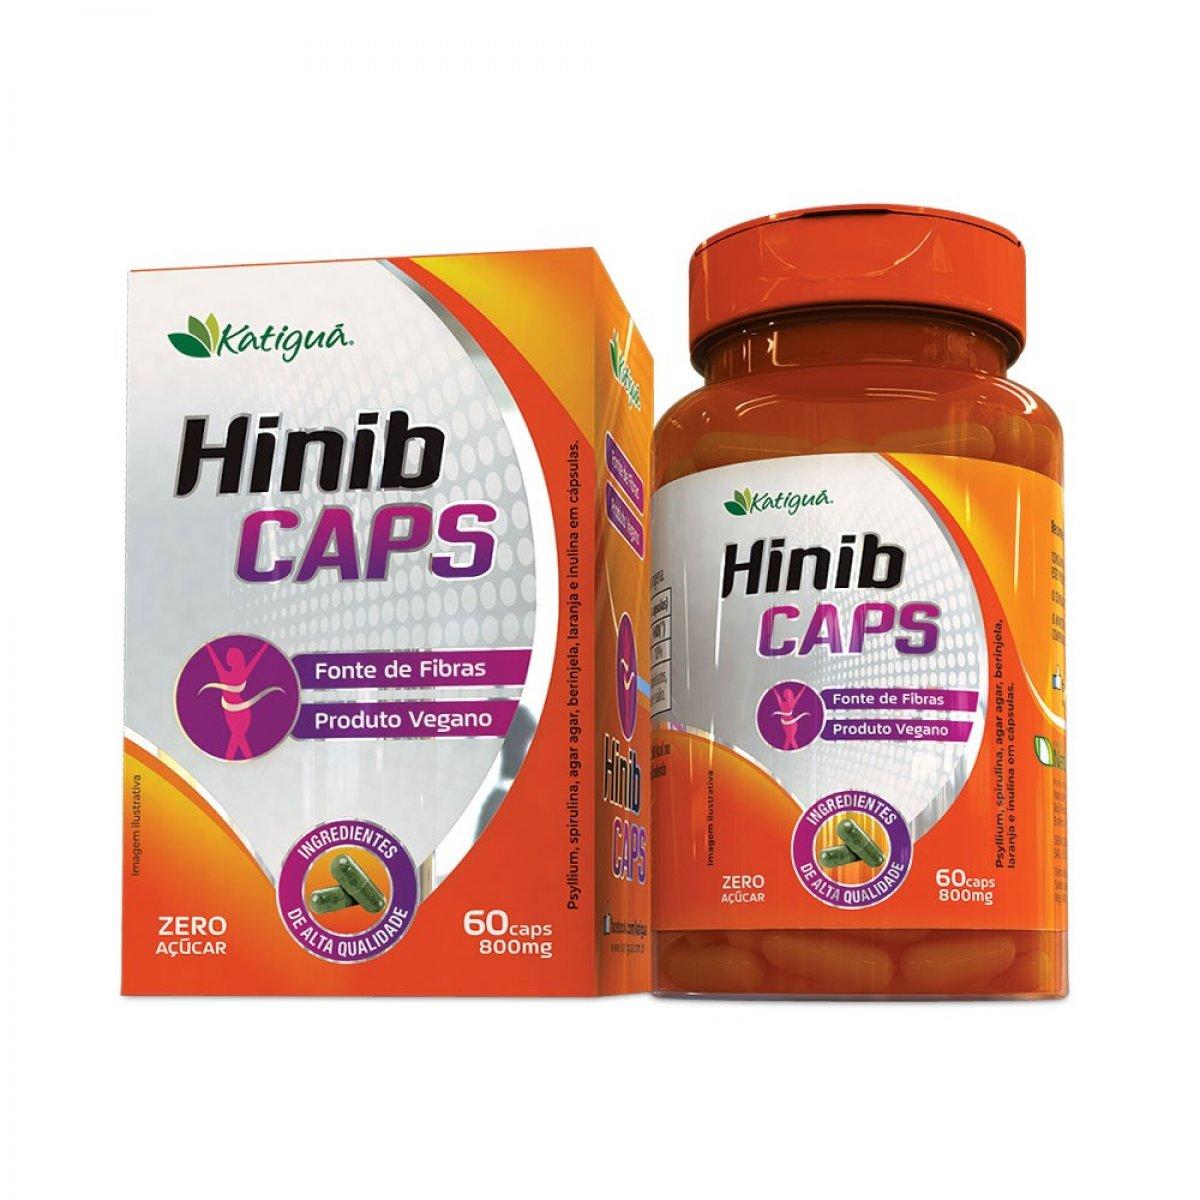 Hinib Caps - Psylium, Spirulina, Agar Agar, Berinjela, Laranja e Inulina em Cápsulas-main